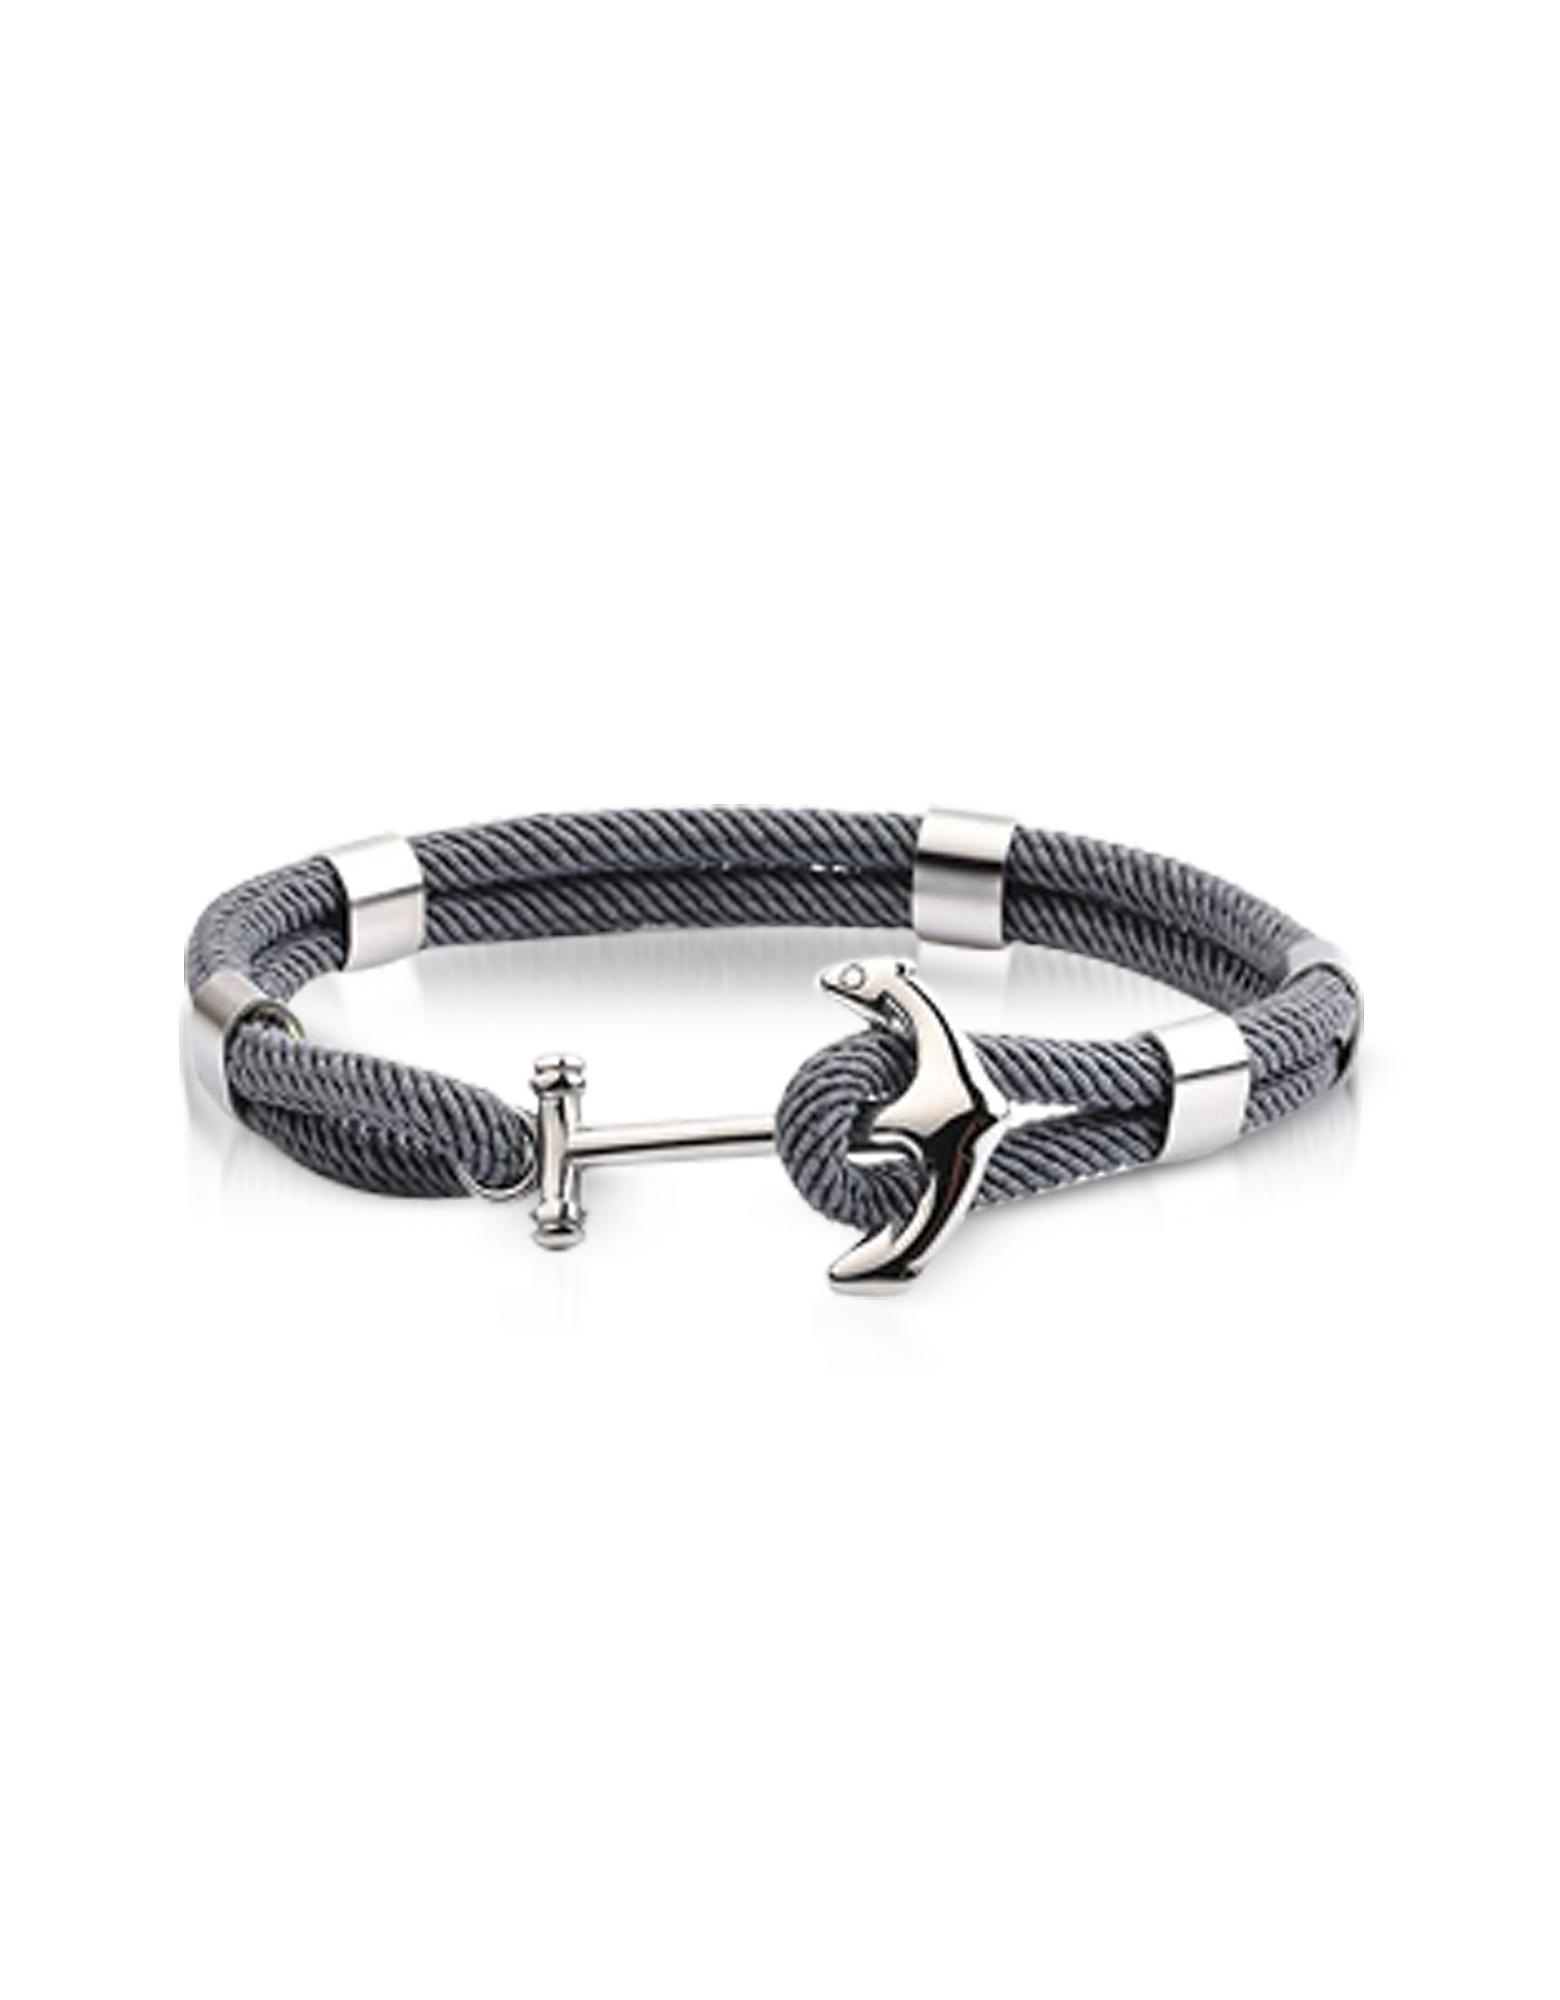 Forzieri Men's Bracelets, Dark Gray Nautical Rope Double Bracelet w/Anchor